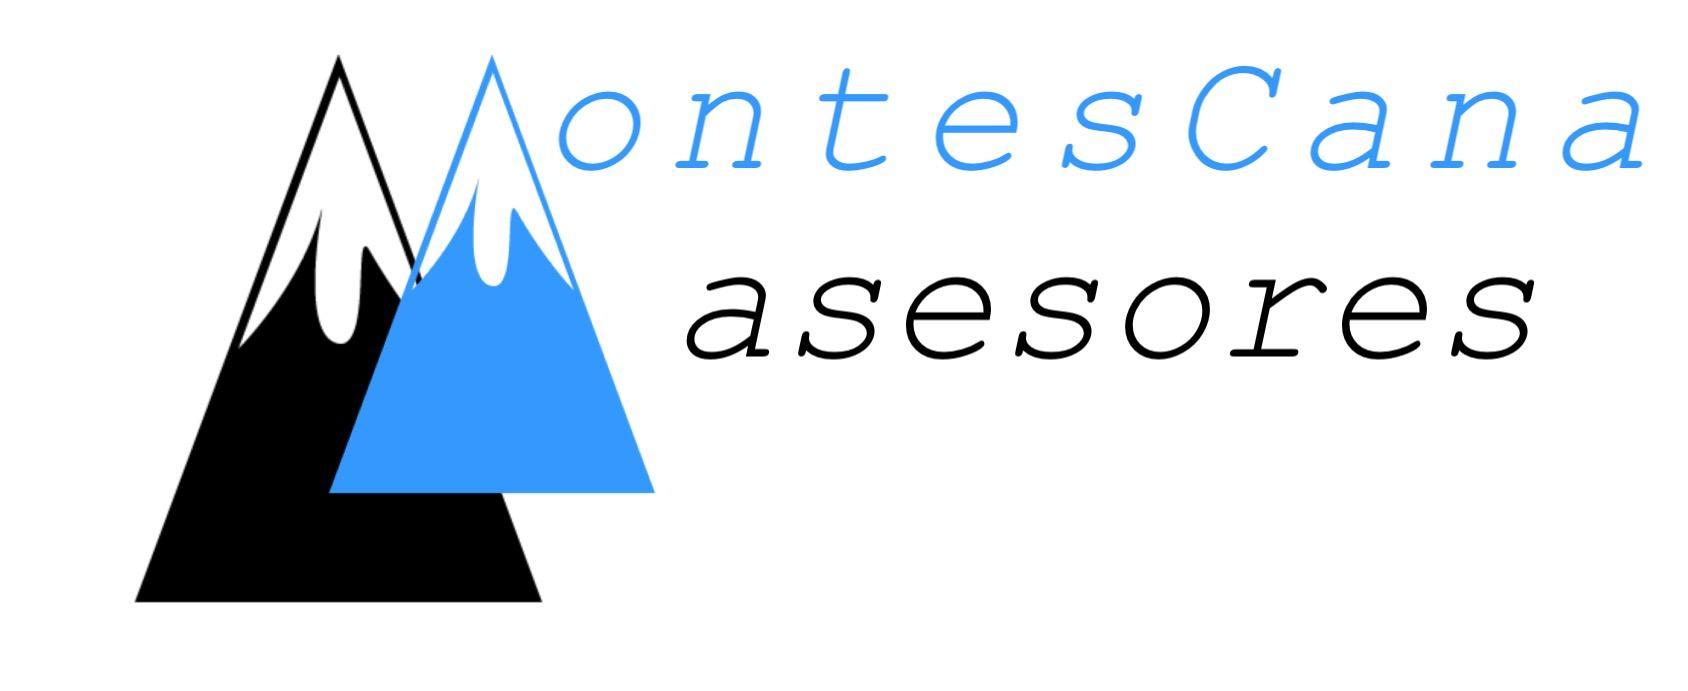 MONTESCANA ASESORIA